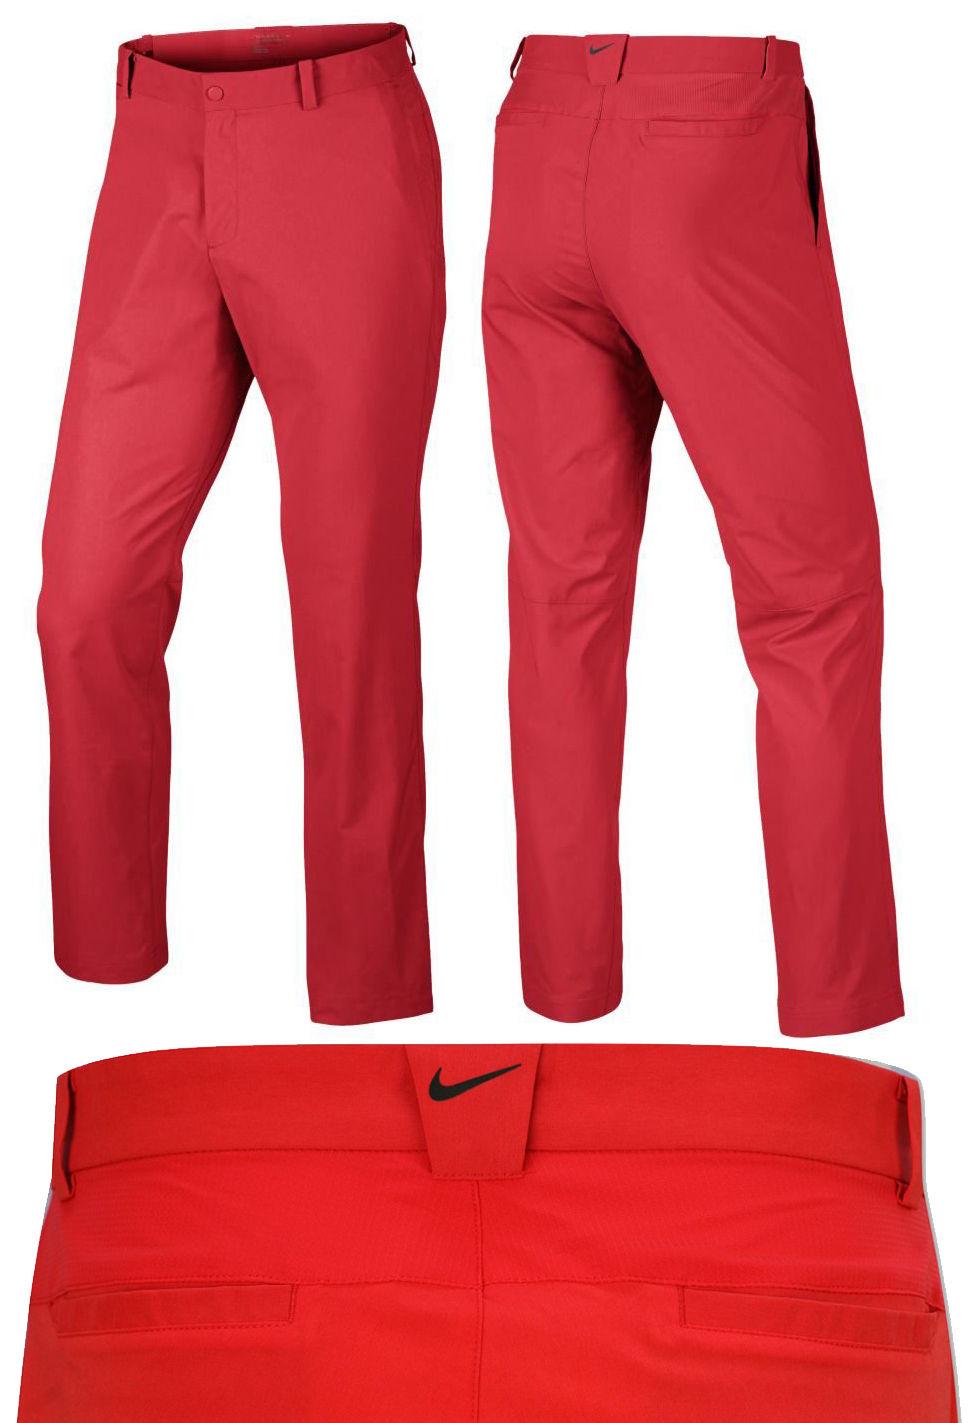 a6164b8a0286 Nike Golf Dri Fit Modern Tech Pants Mens Golf Trousers – RED ALL SIZES –  RRP£65